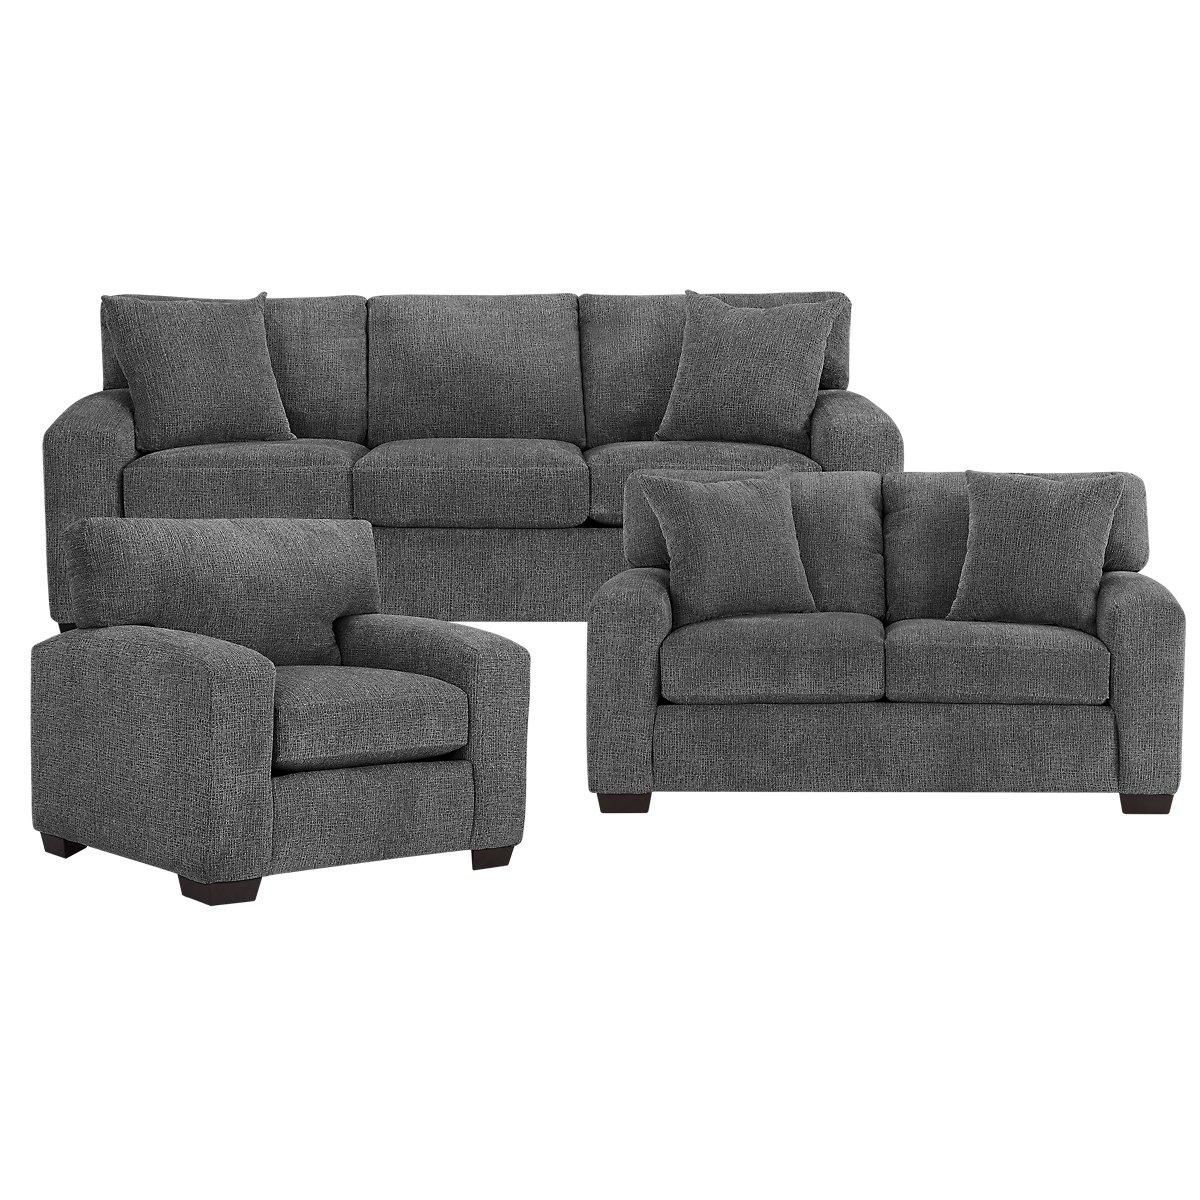 Adam Dark Gray Microfiber Living Room - City Furniture: Adam Dark Gray Microfiber Living Room